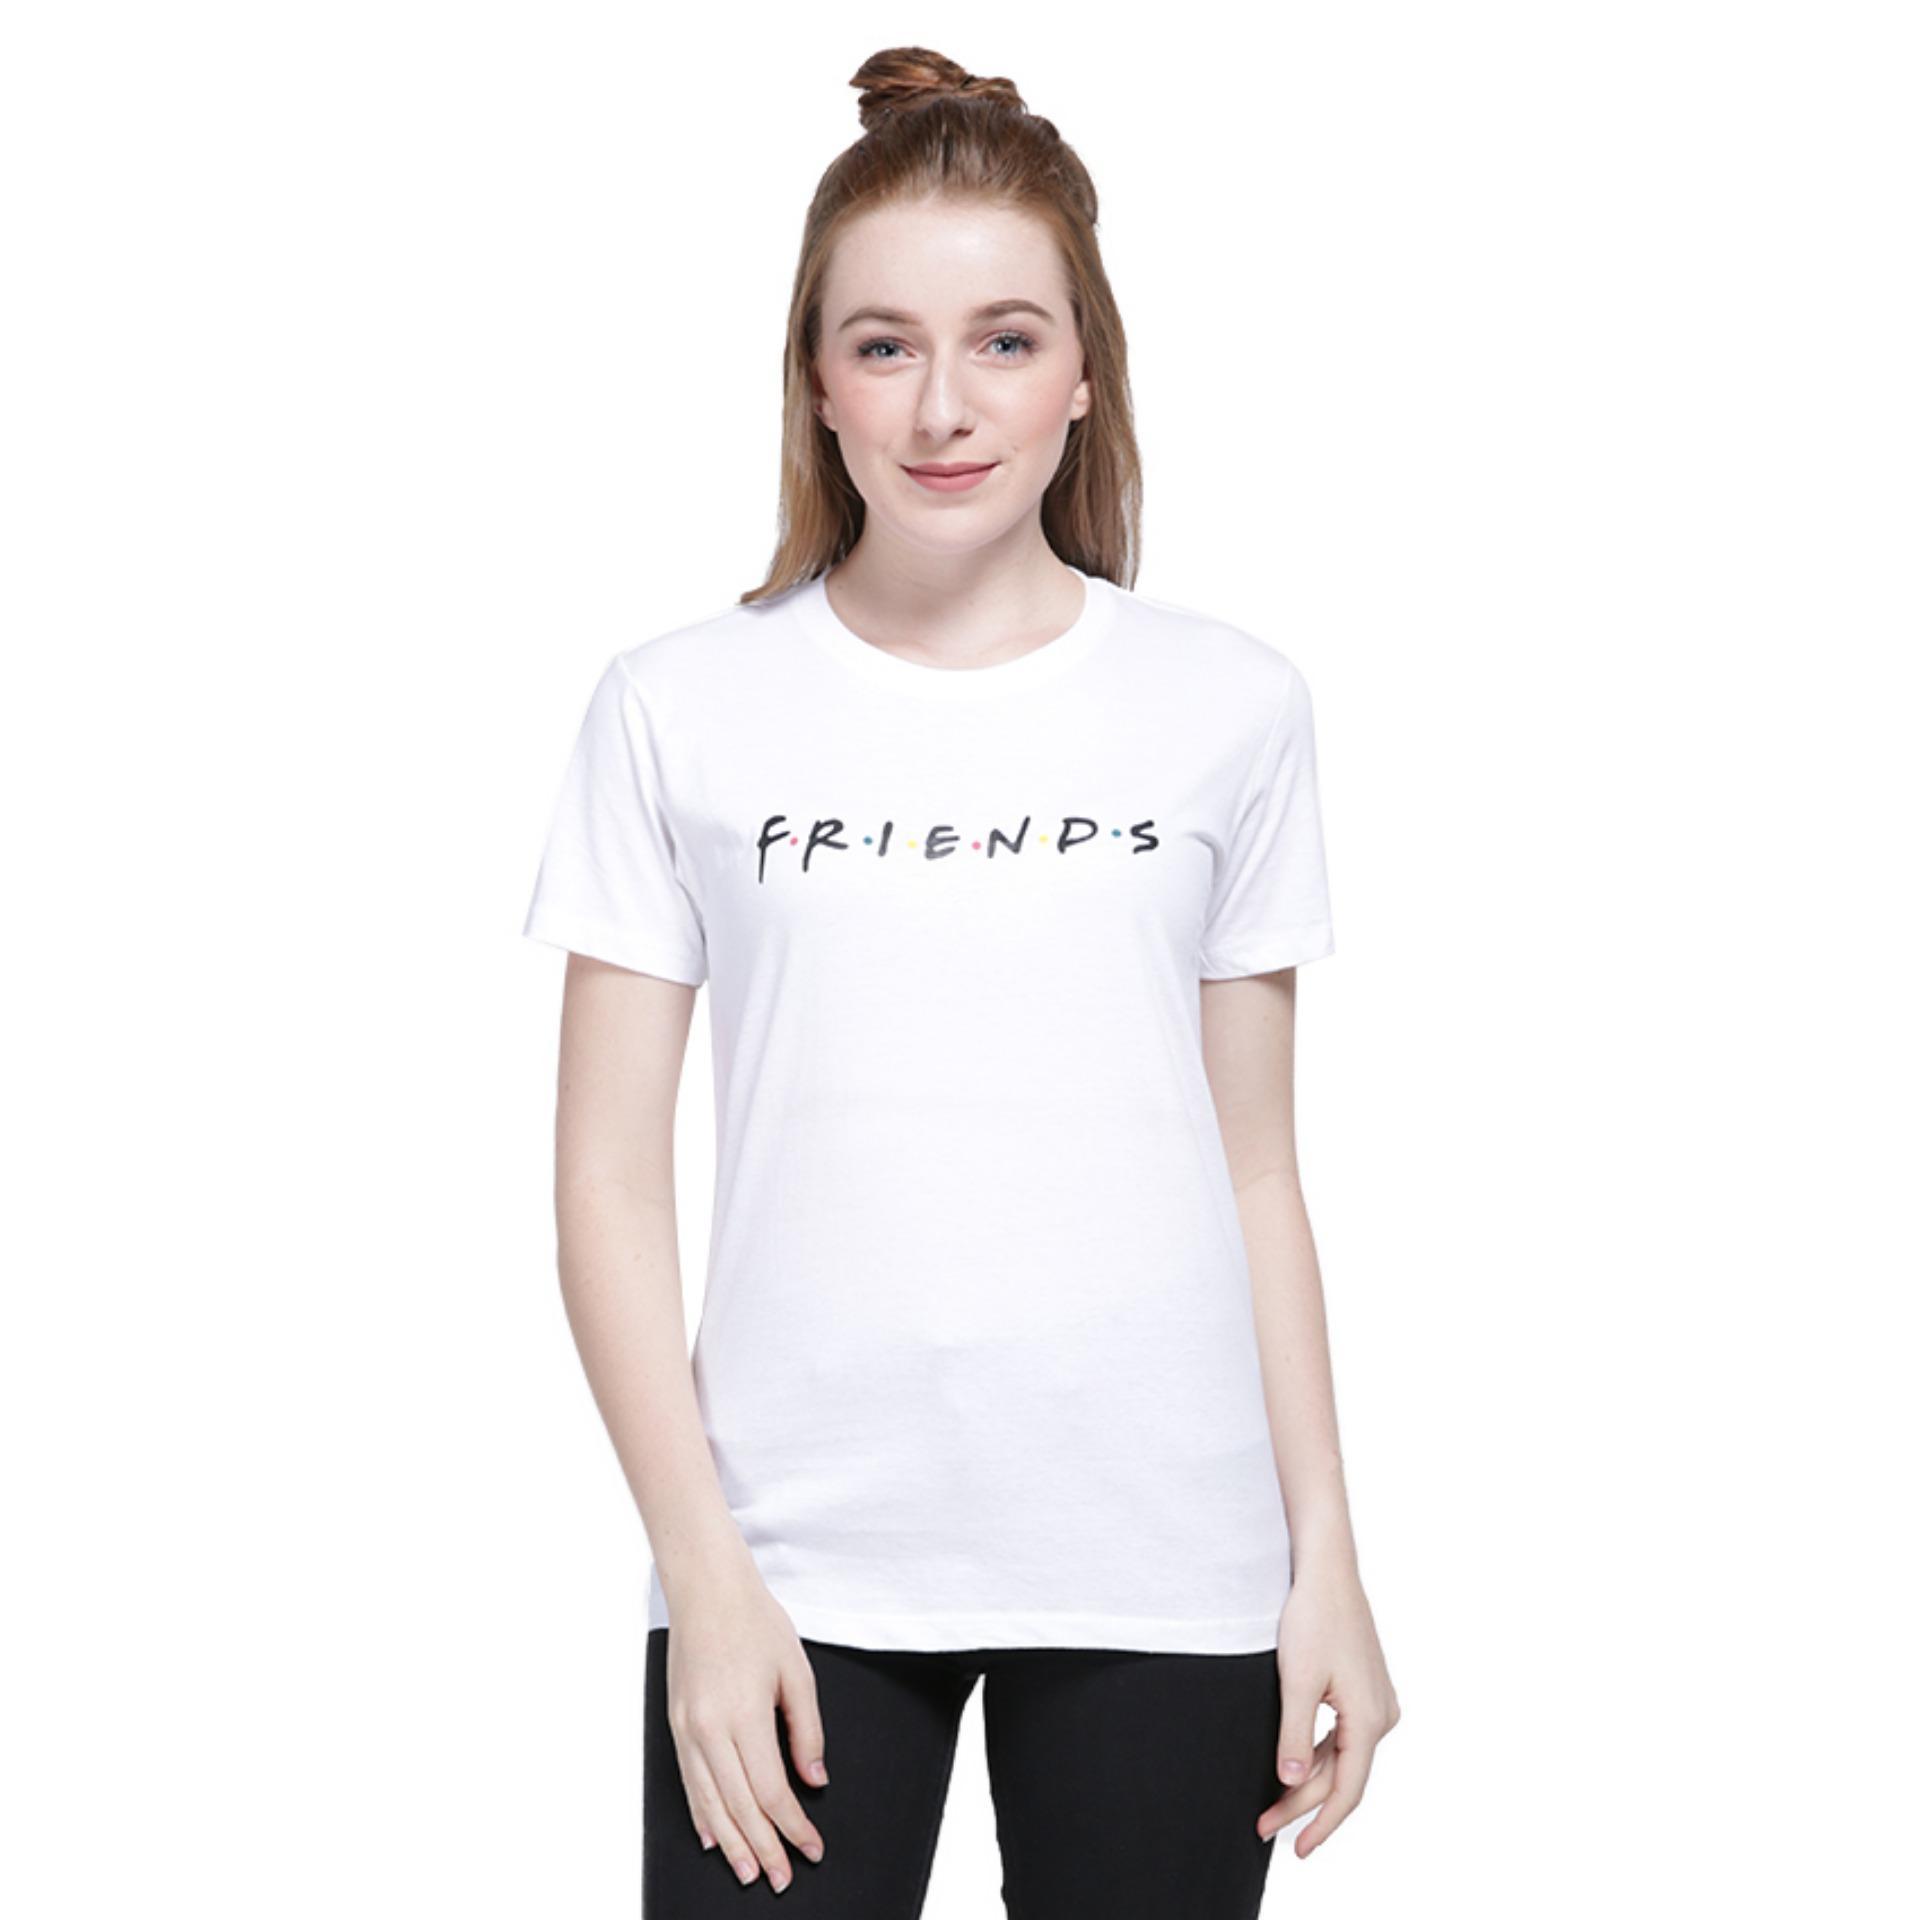 Vanwin - Tumblr Tee / Kaos Cewek / T-Shirt Wanita Friends